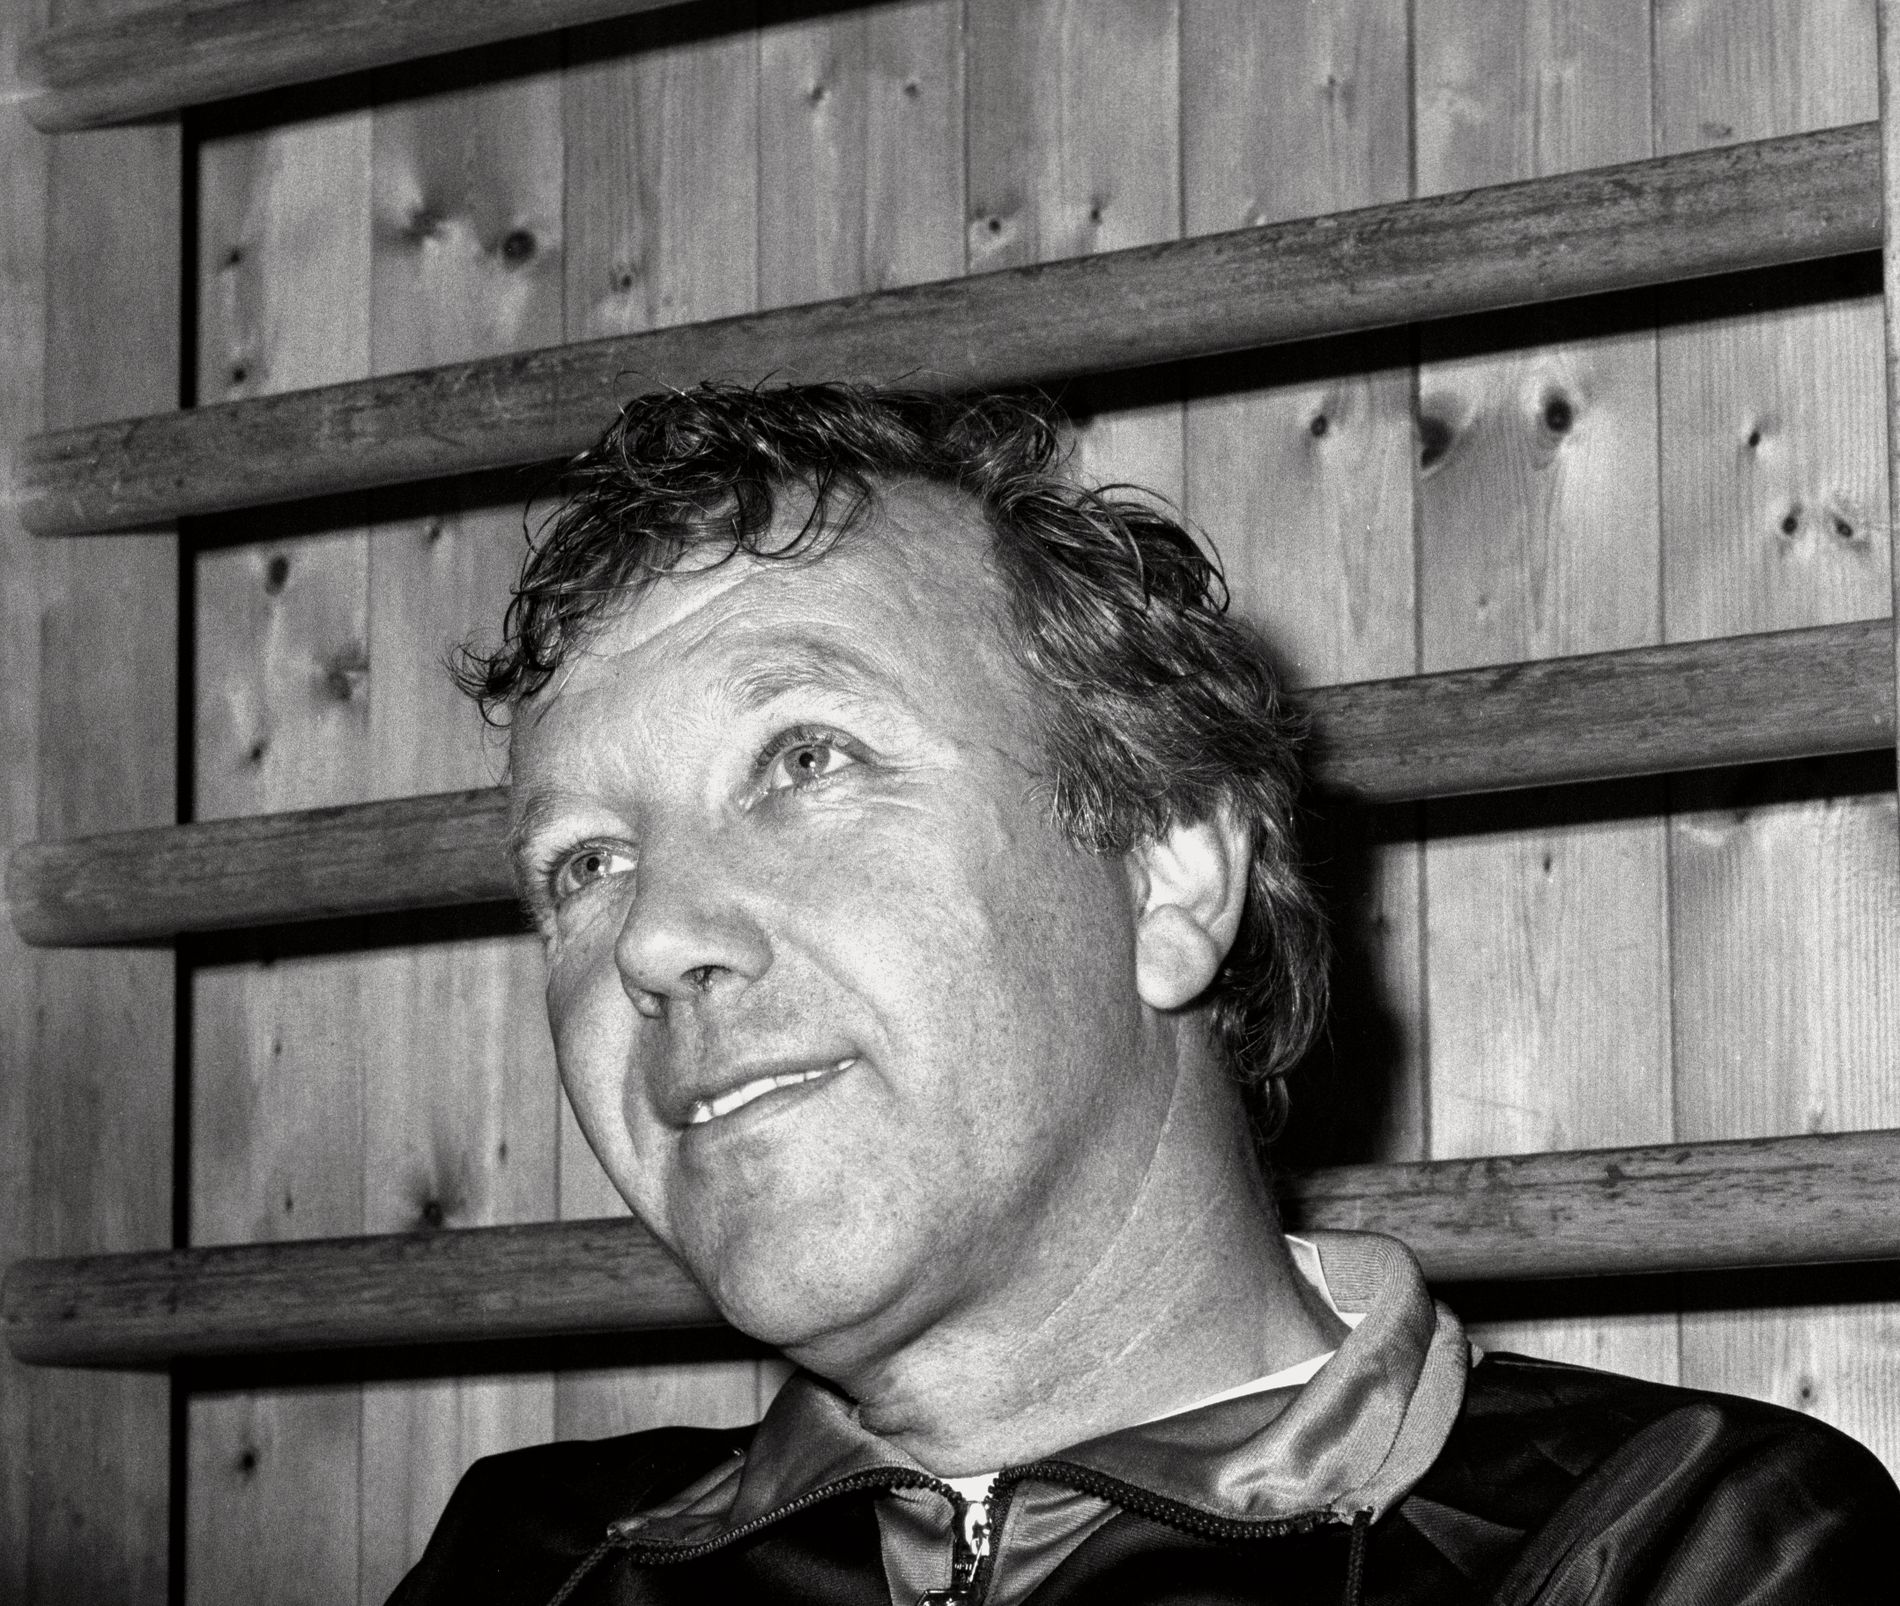 DEN SISTE KAMPEN: Norge – Frankrike 2-0, Ullevaal stadion, 1987. Landslagssjef Tor Røste Fossen var strålende fornøyd med lagets innsats i den siste kampen han var ansvarlig for. Nå er han død, 77 år gammel.